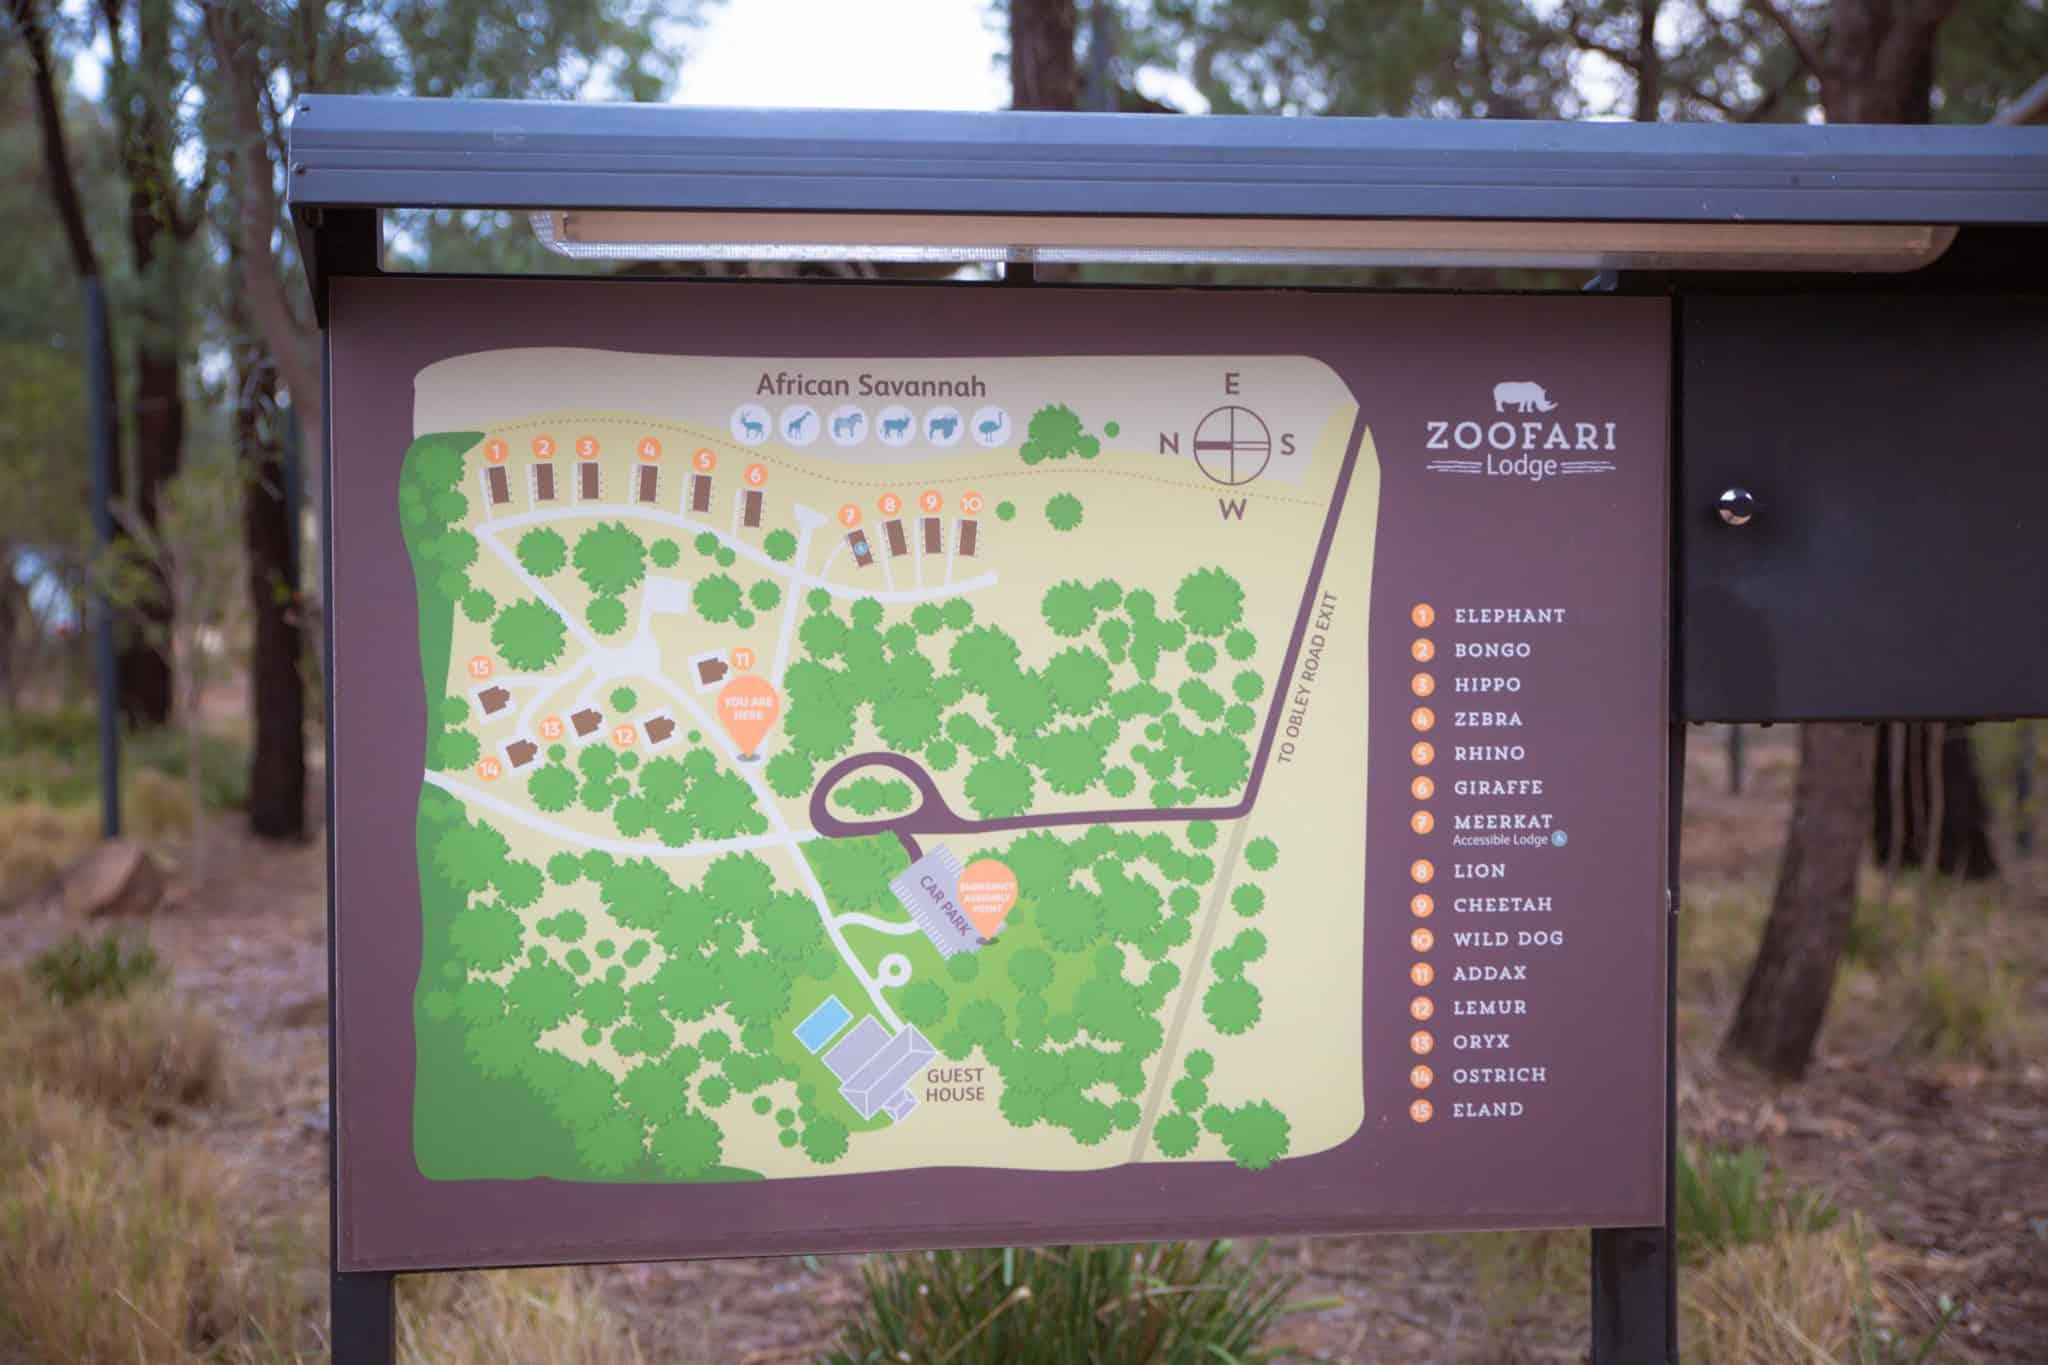 Travel With Meraki- Taronga Western Plains Zoo Dubbo Australia Zoofari Lodge